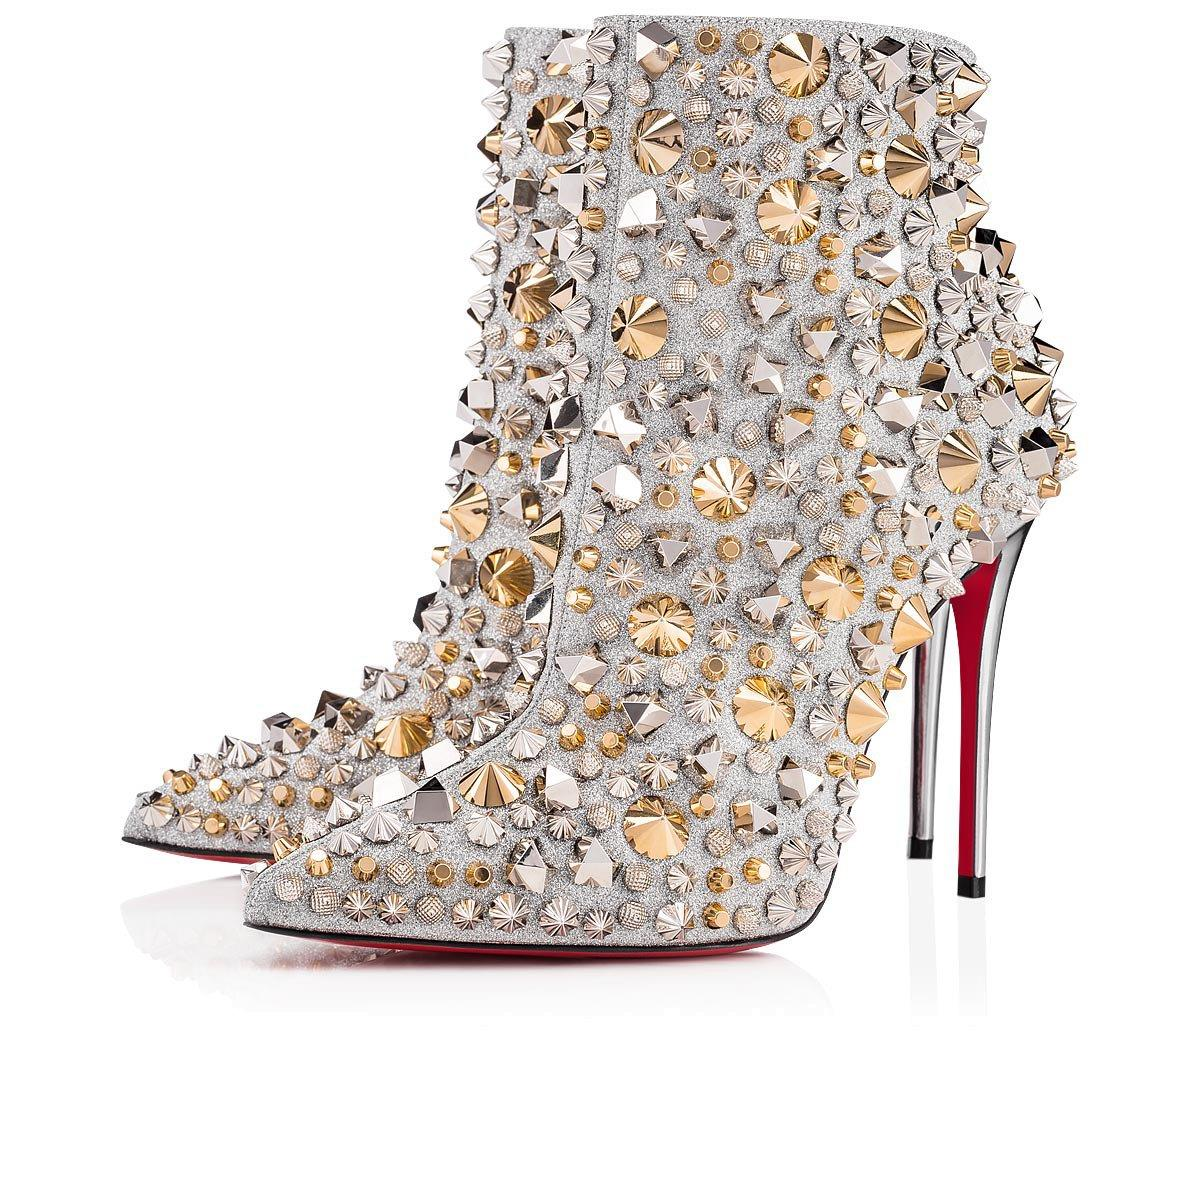 Christian_Louboutin_So_Full_Kate_Calf_Glitter_Boots